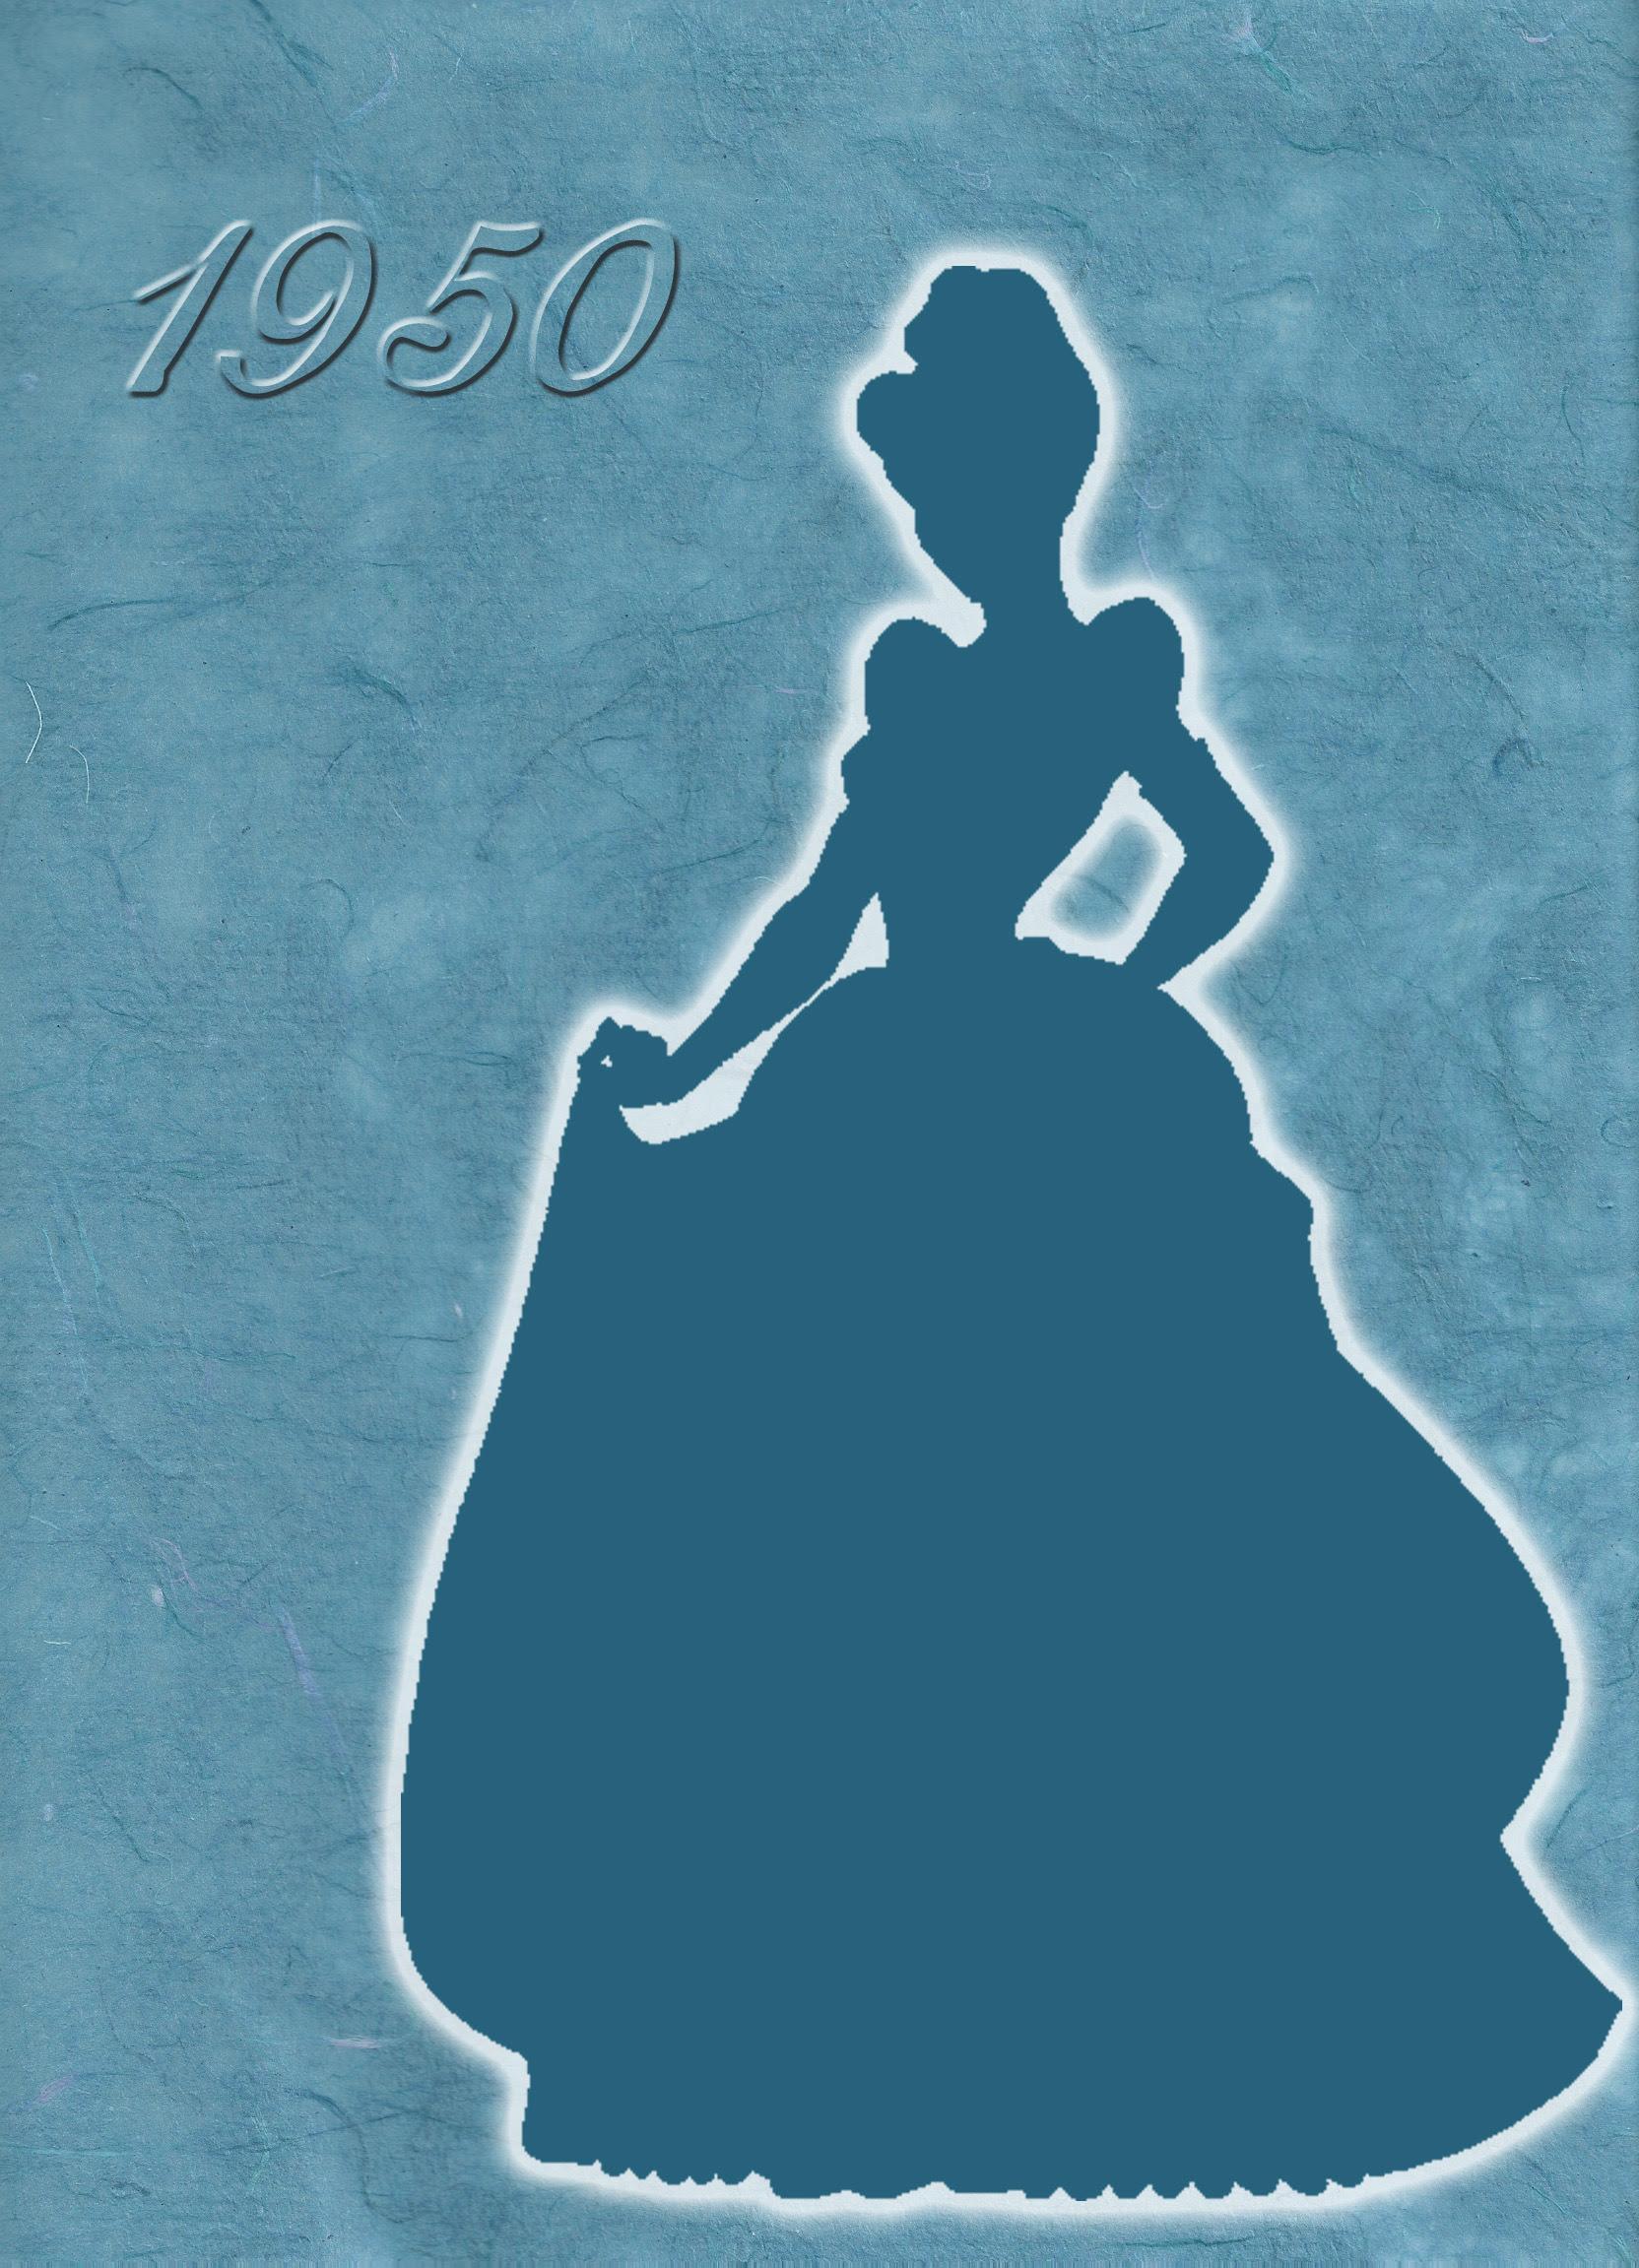 Disney Princess Release Date Movie - Disney Princess Photo ...